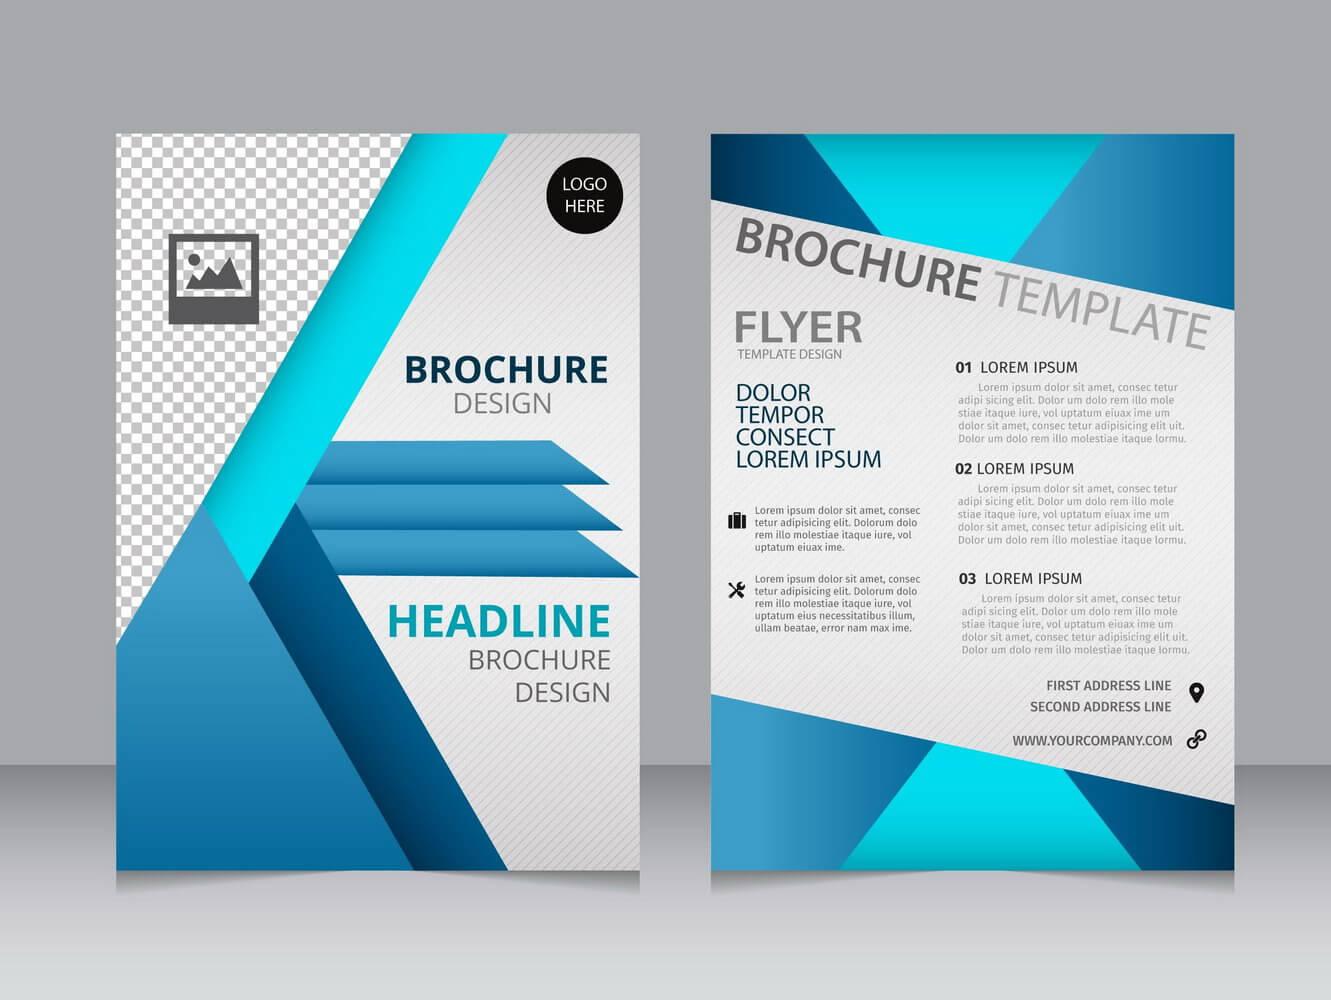 Free Brochure Templates Word – Templates #odywnjq | Resume Intended For Free Brochure Templates For Word 2010